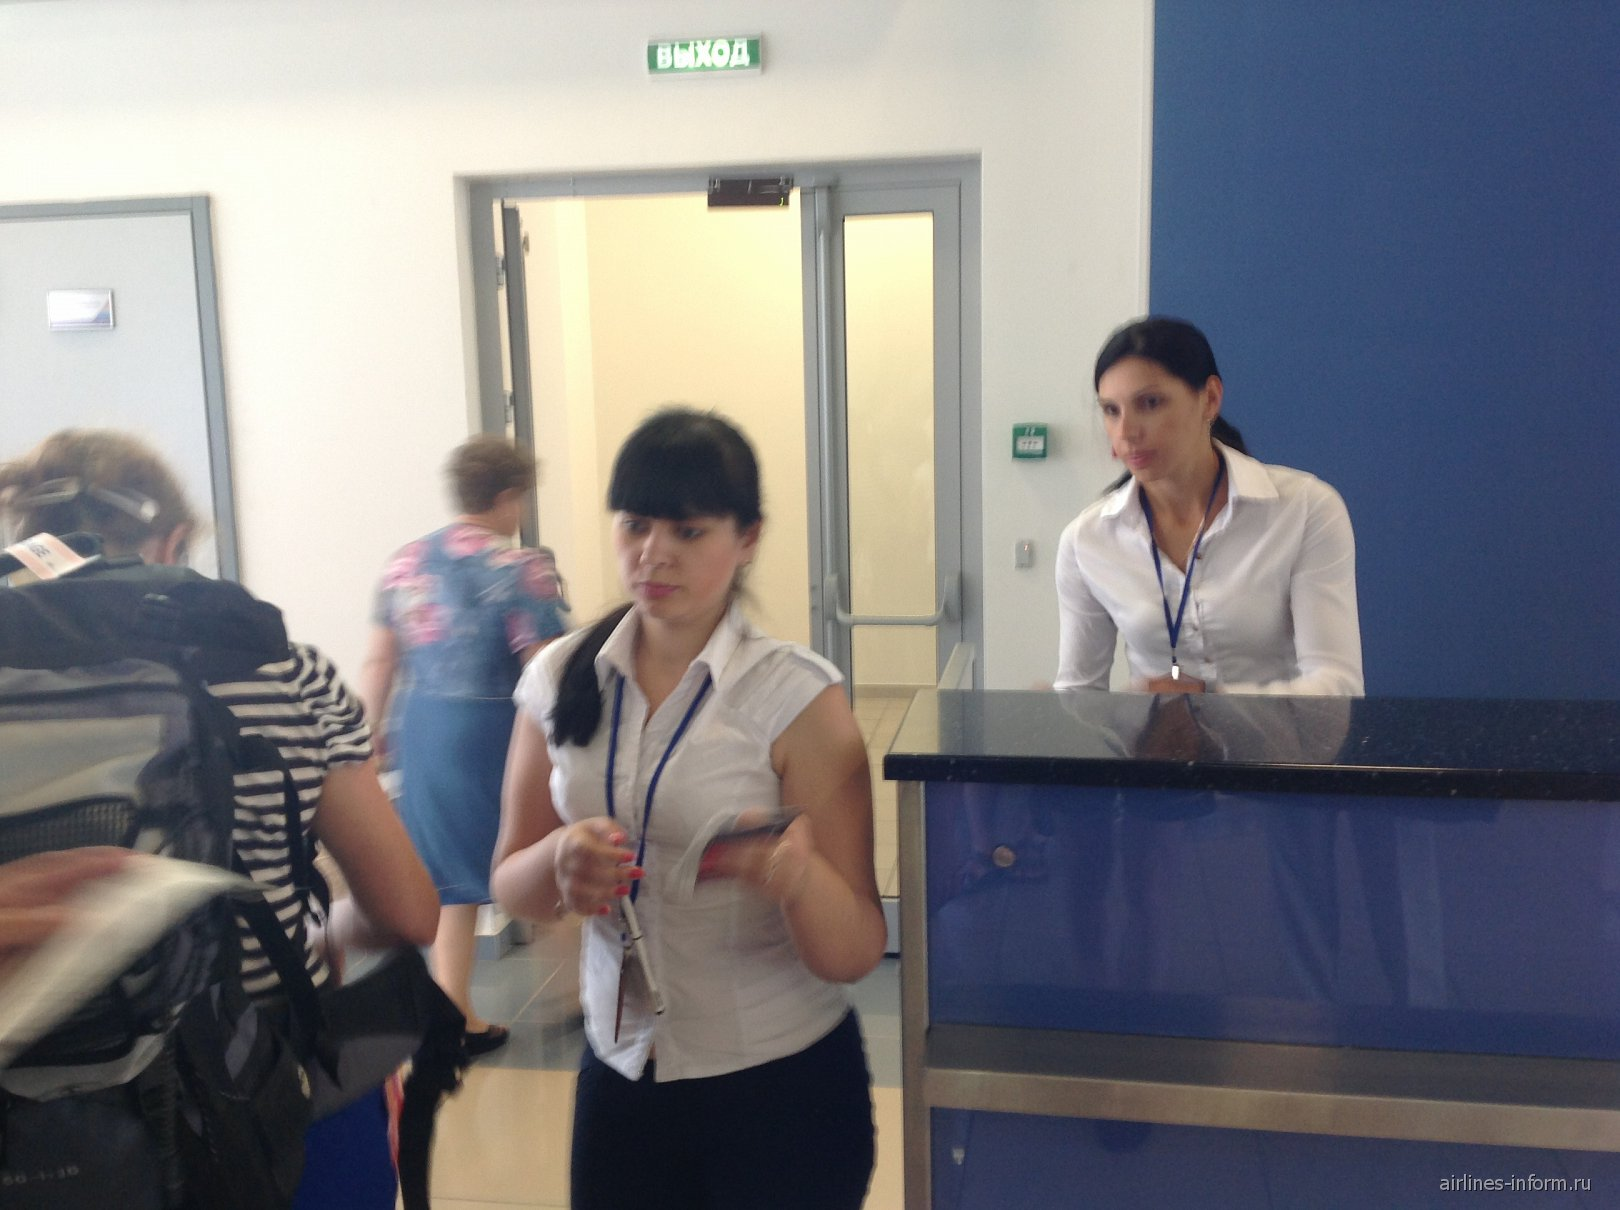 Посадка на рейс Аэрофлота Владивосток-Москва